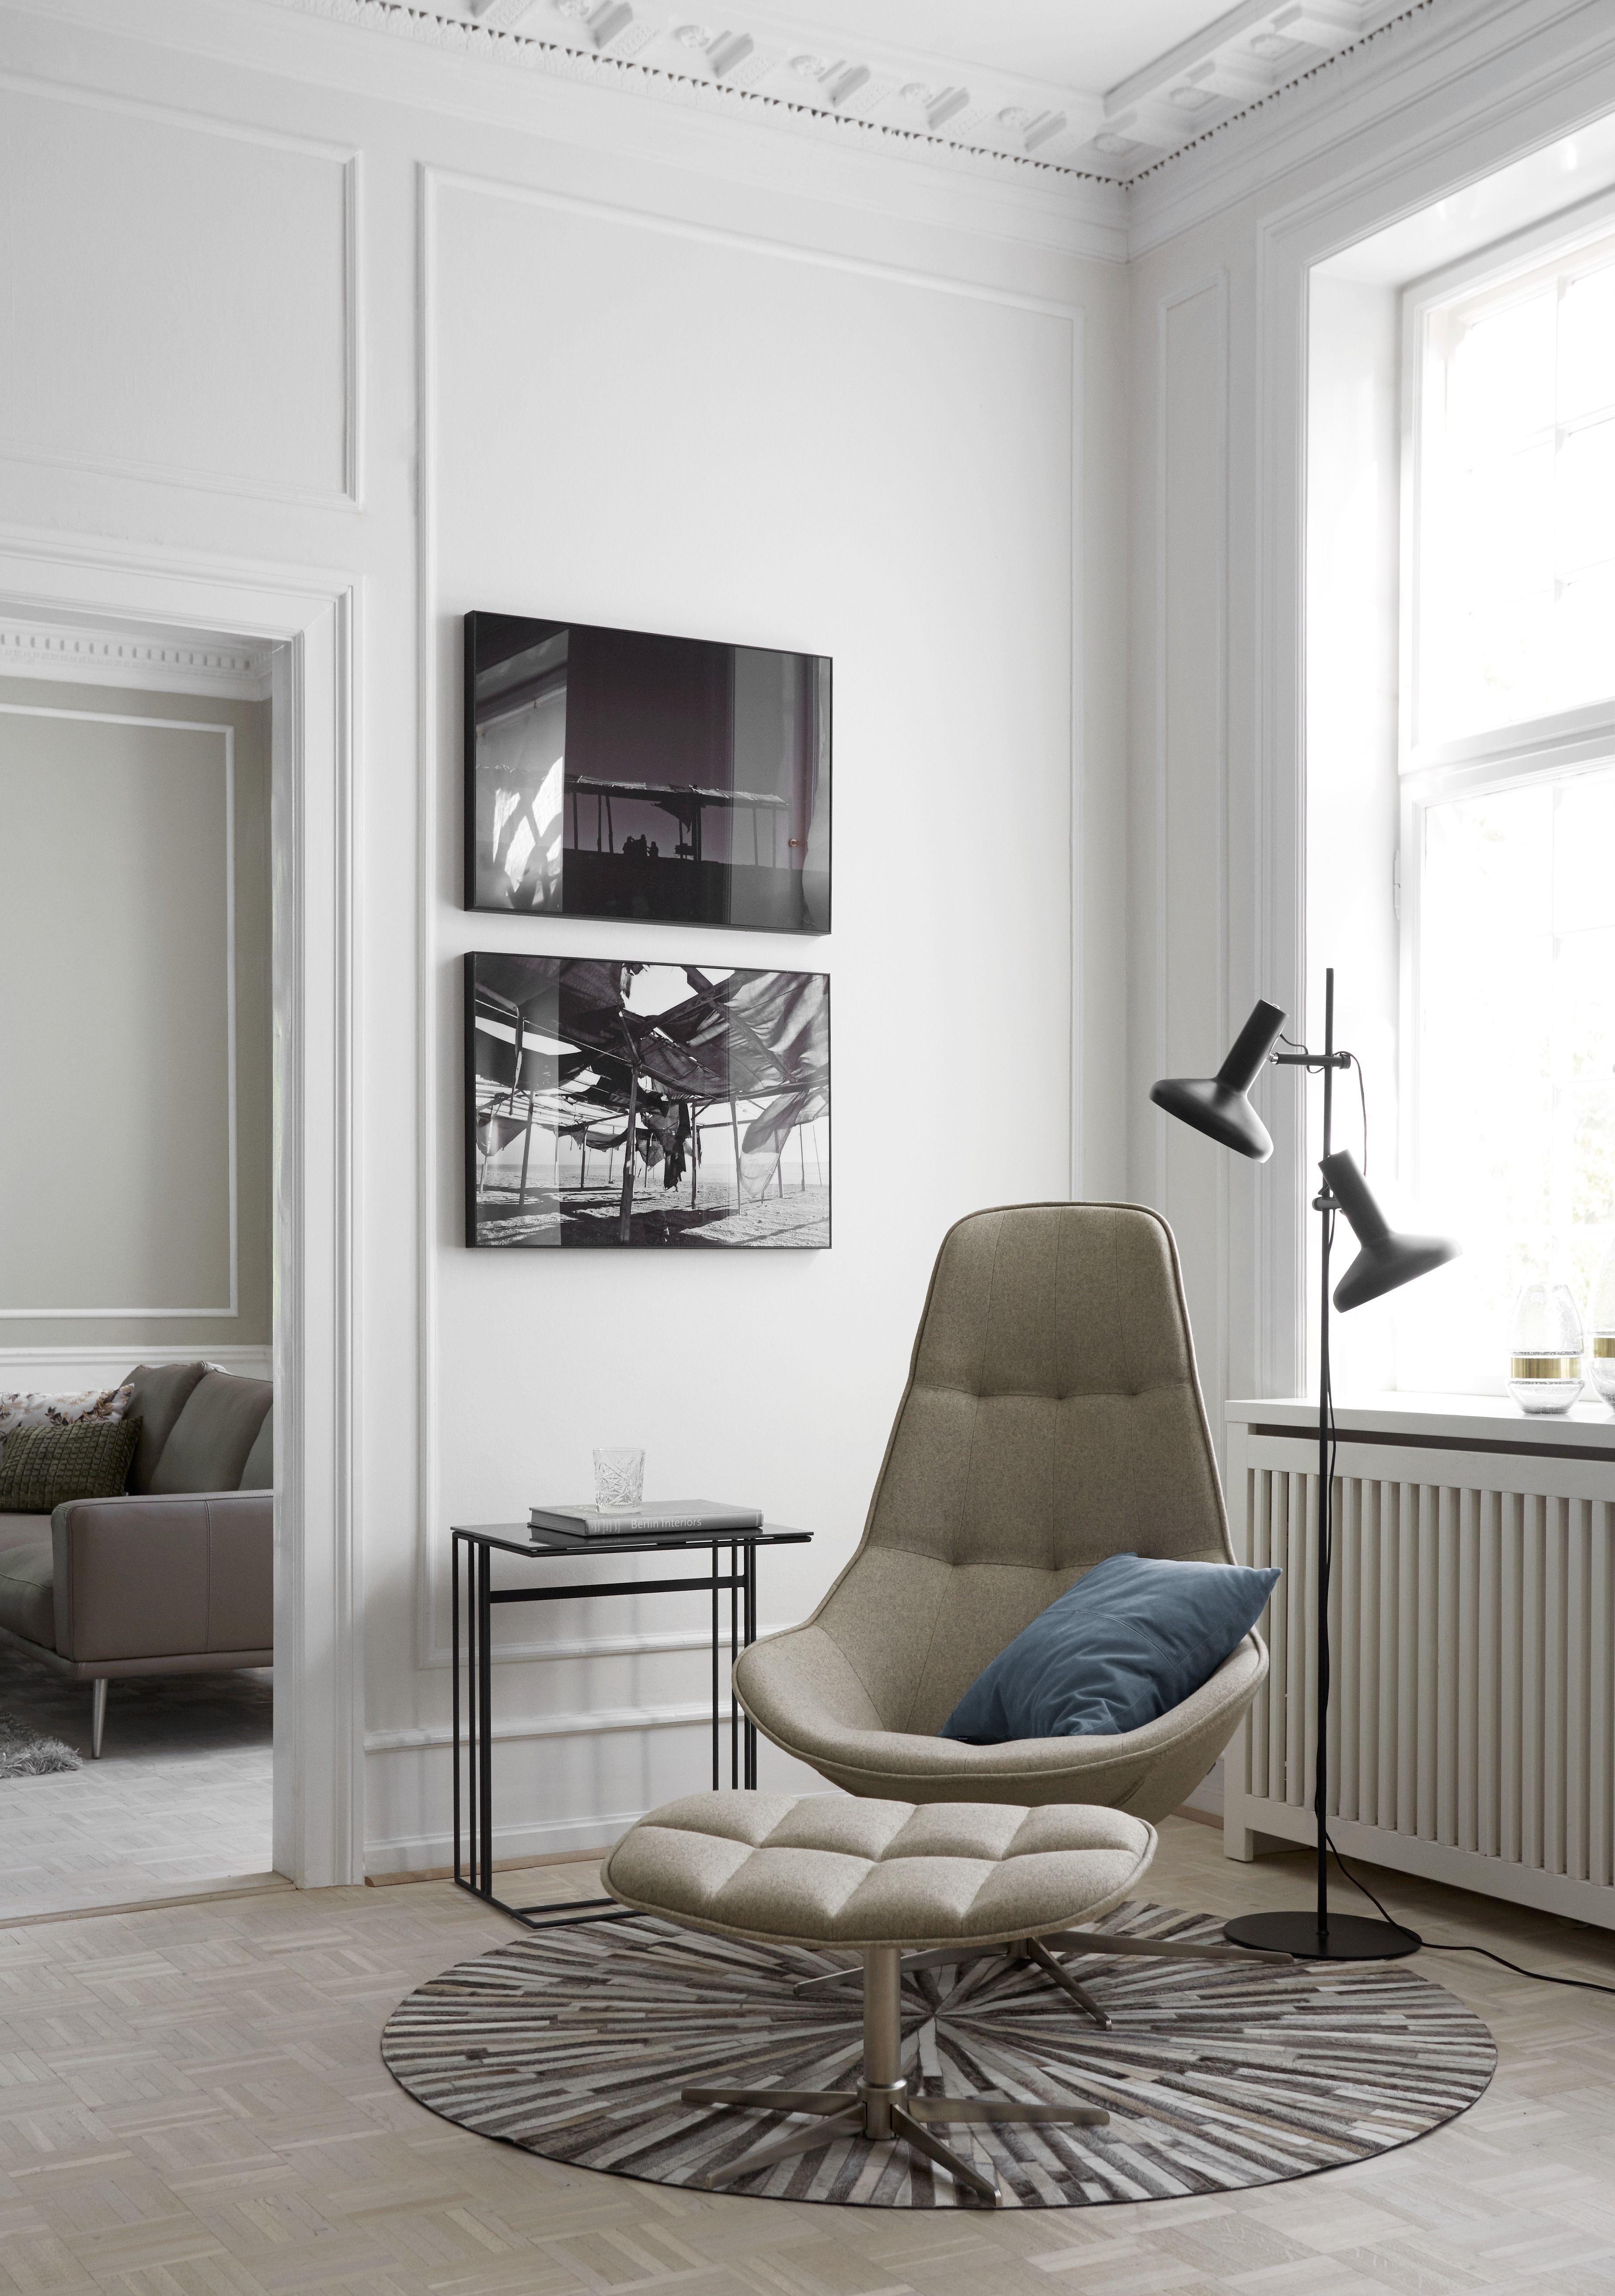 Boston Sessel Mit Duo Stehlampe Boconcept Interiordesign